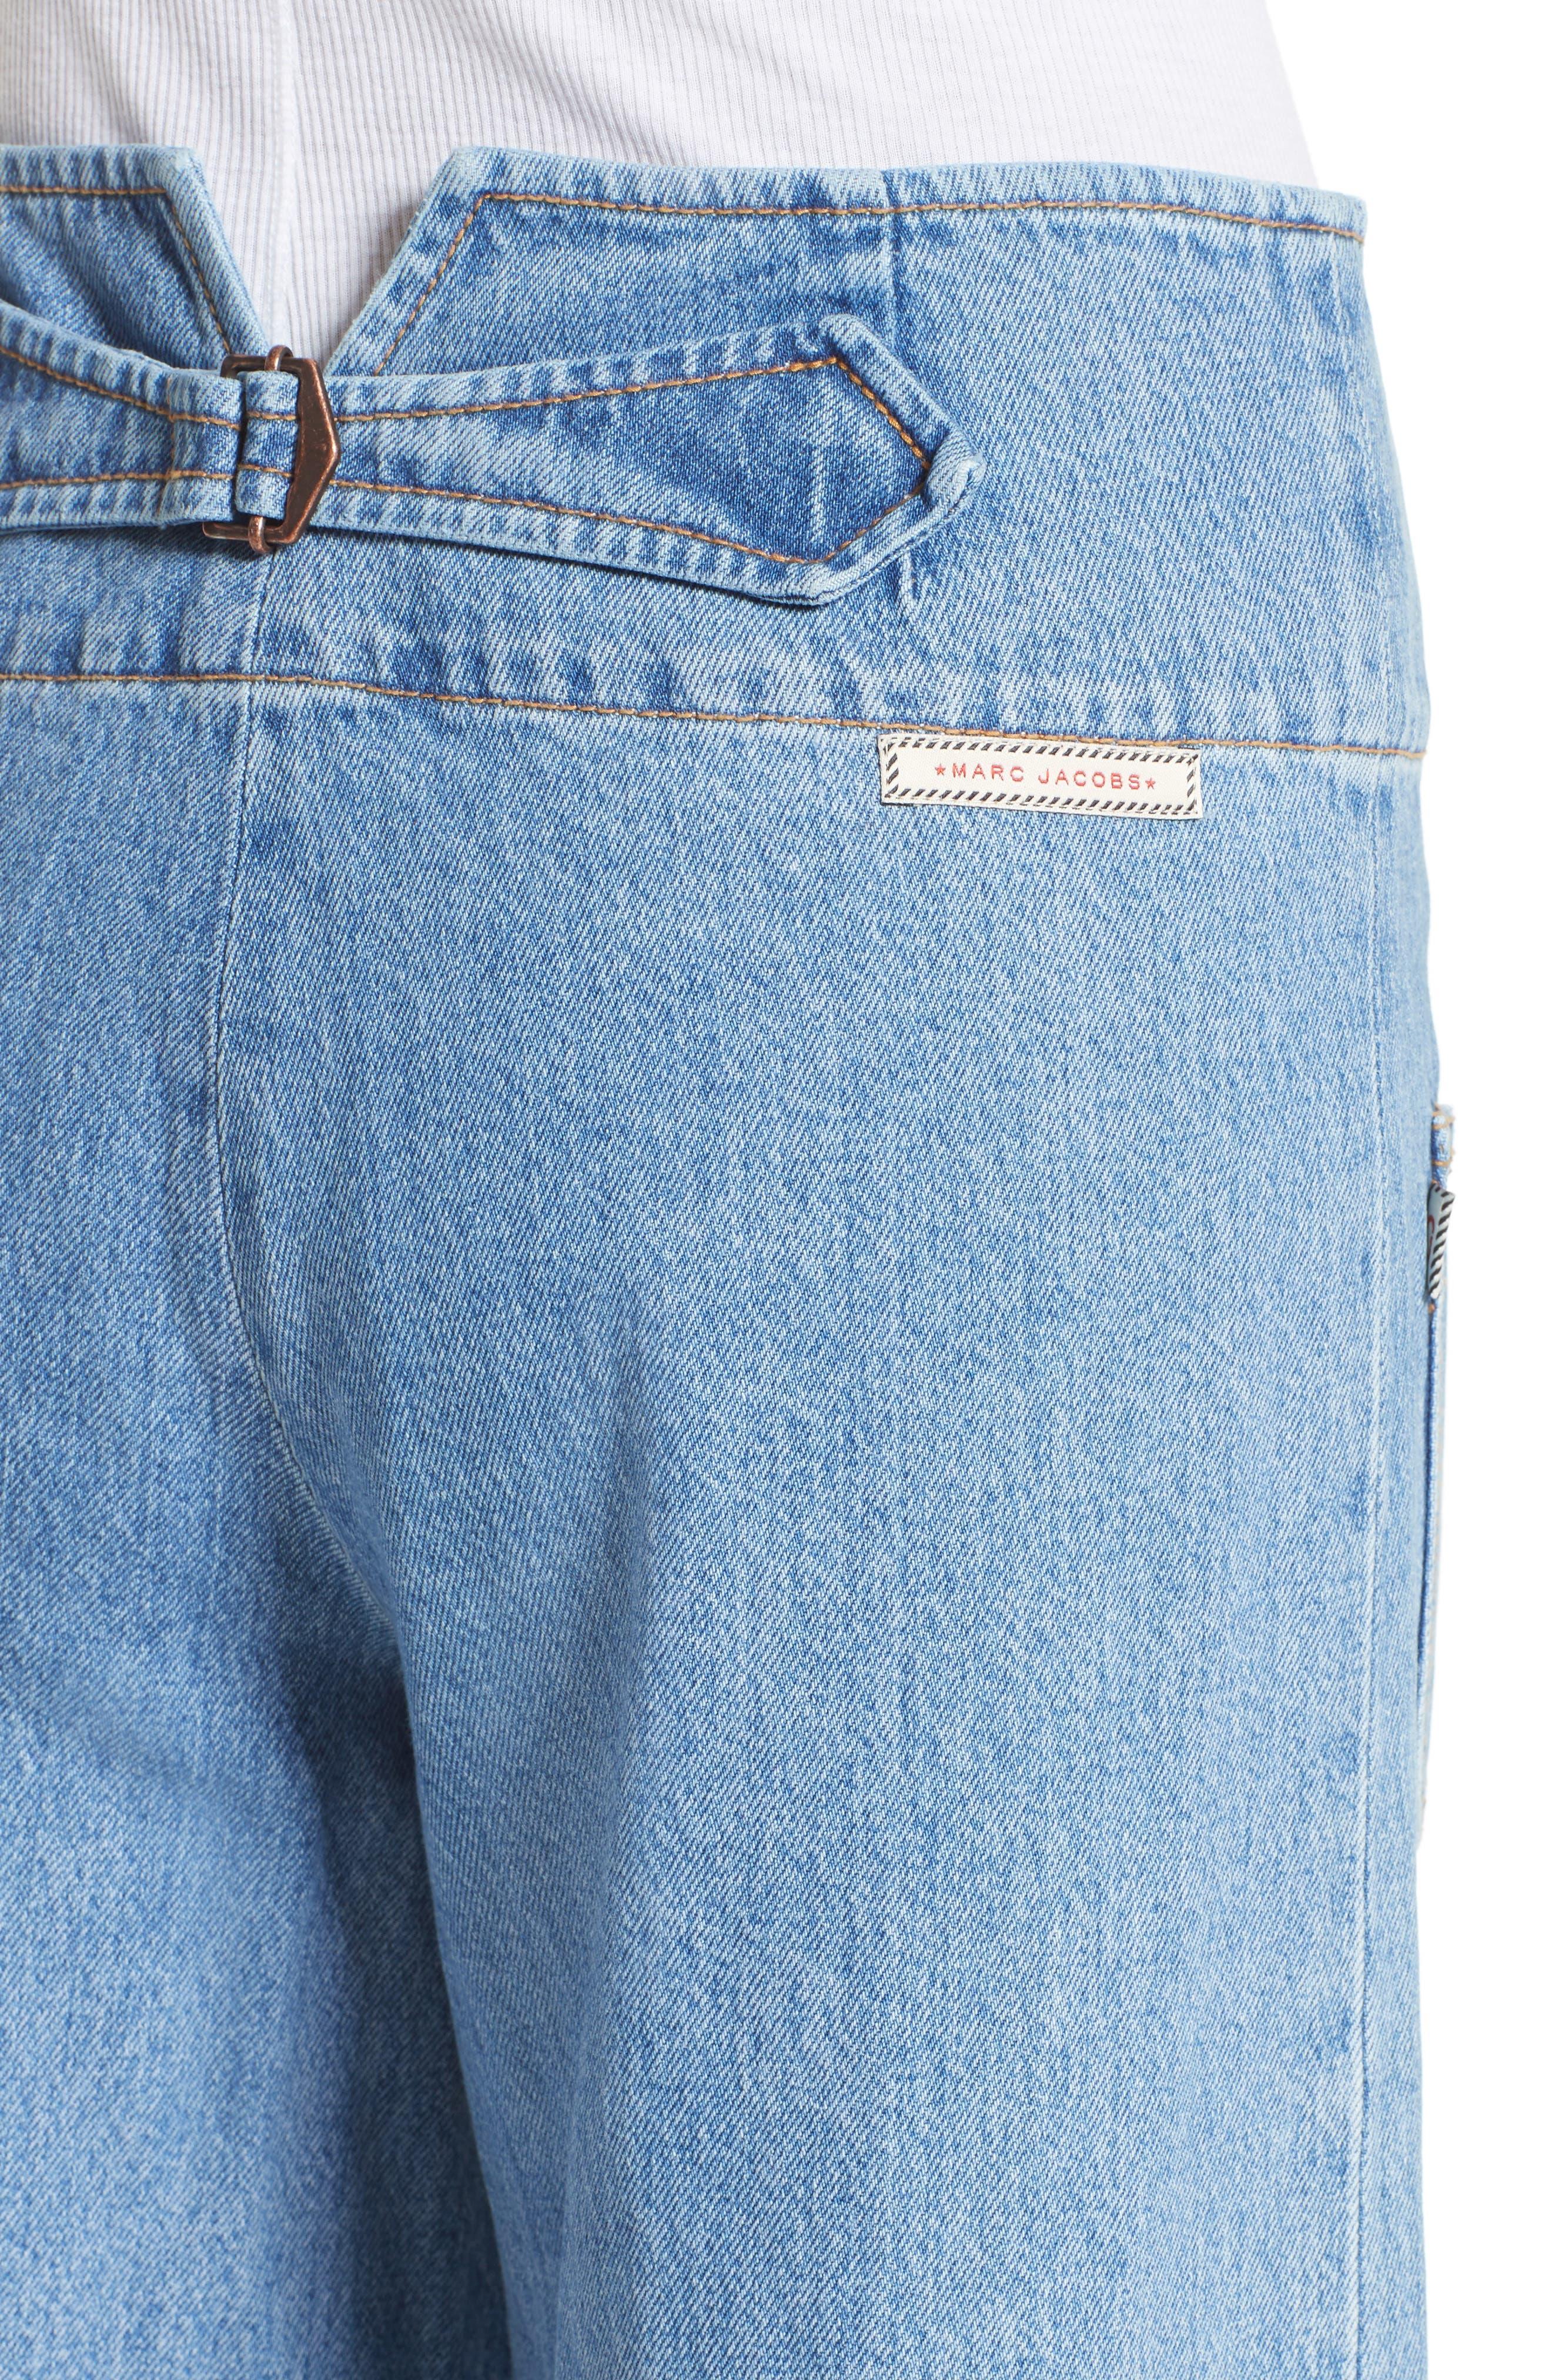 High Waist Crop Flare Jeans,                             Alternate thumbnail 4, color,                             491